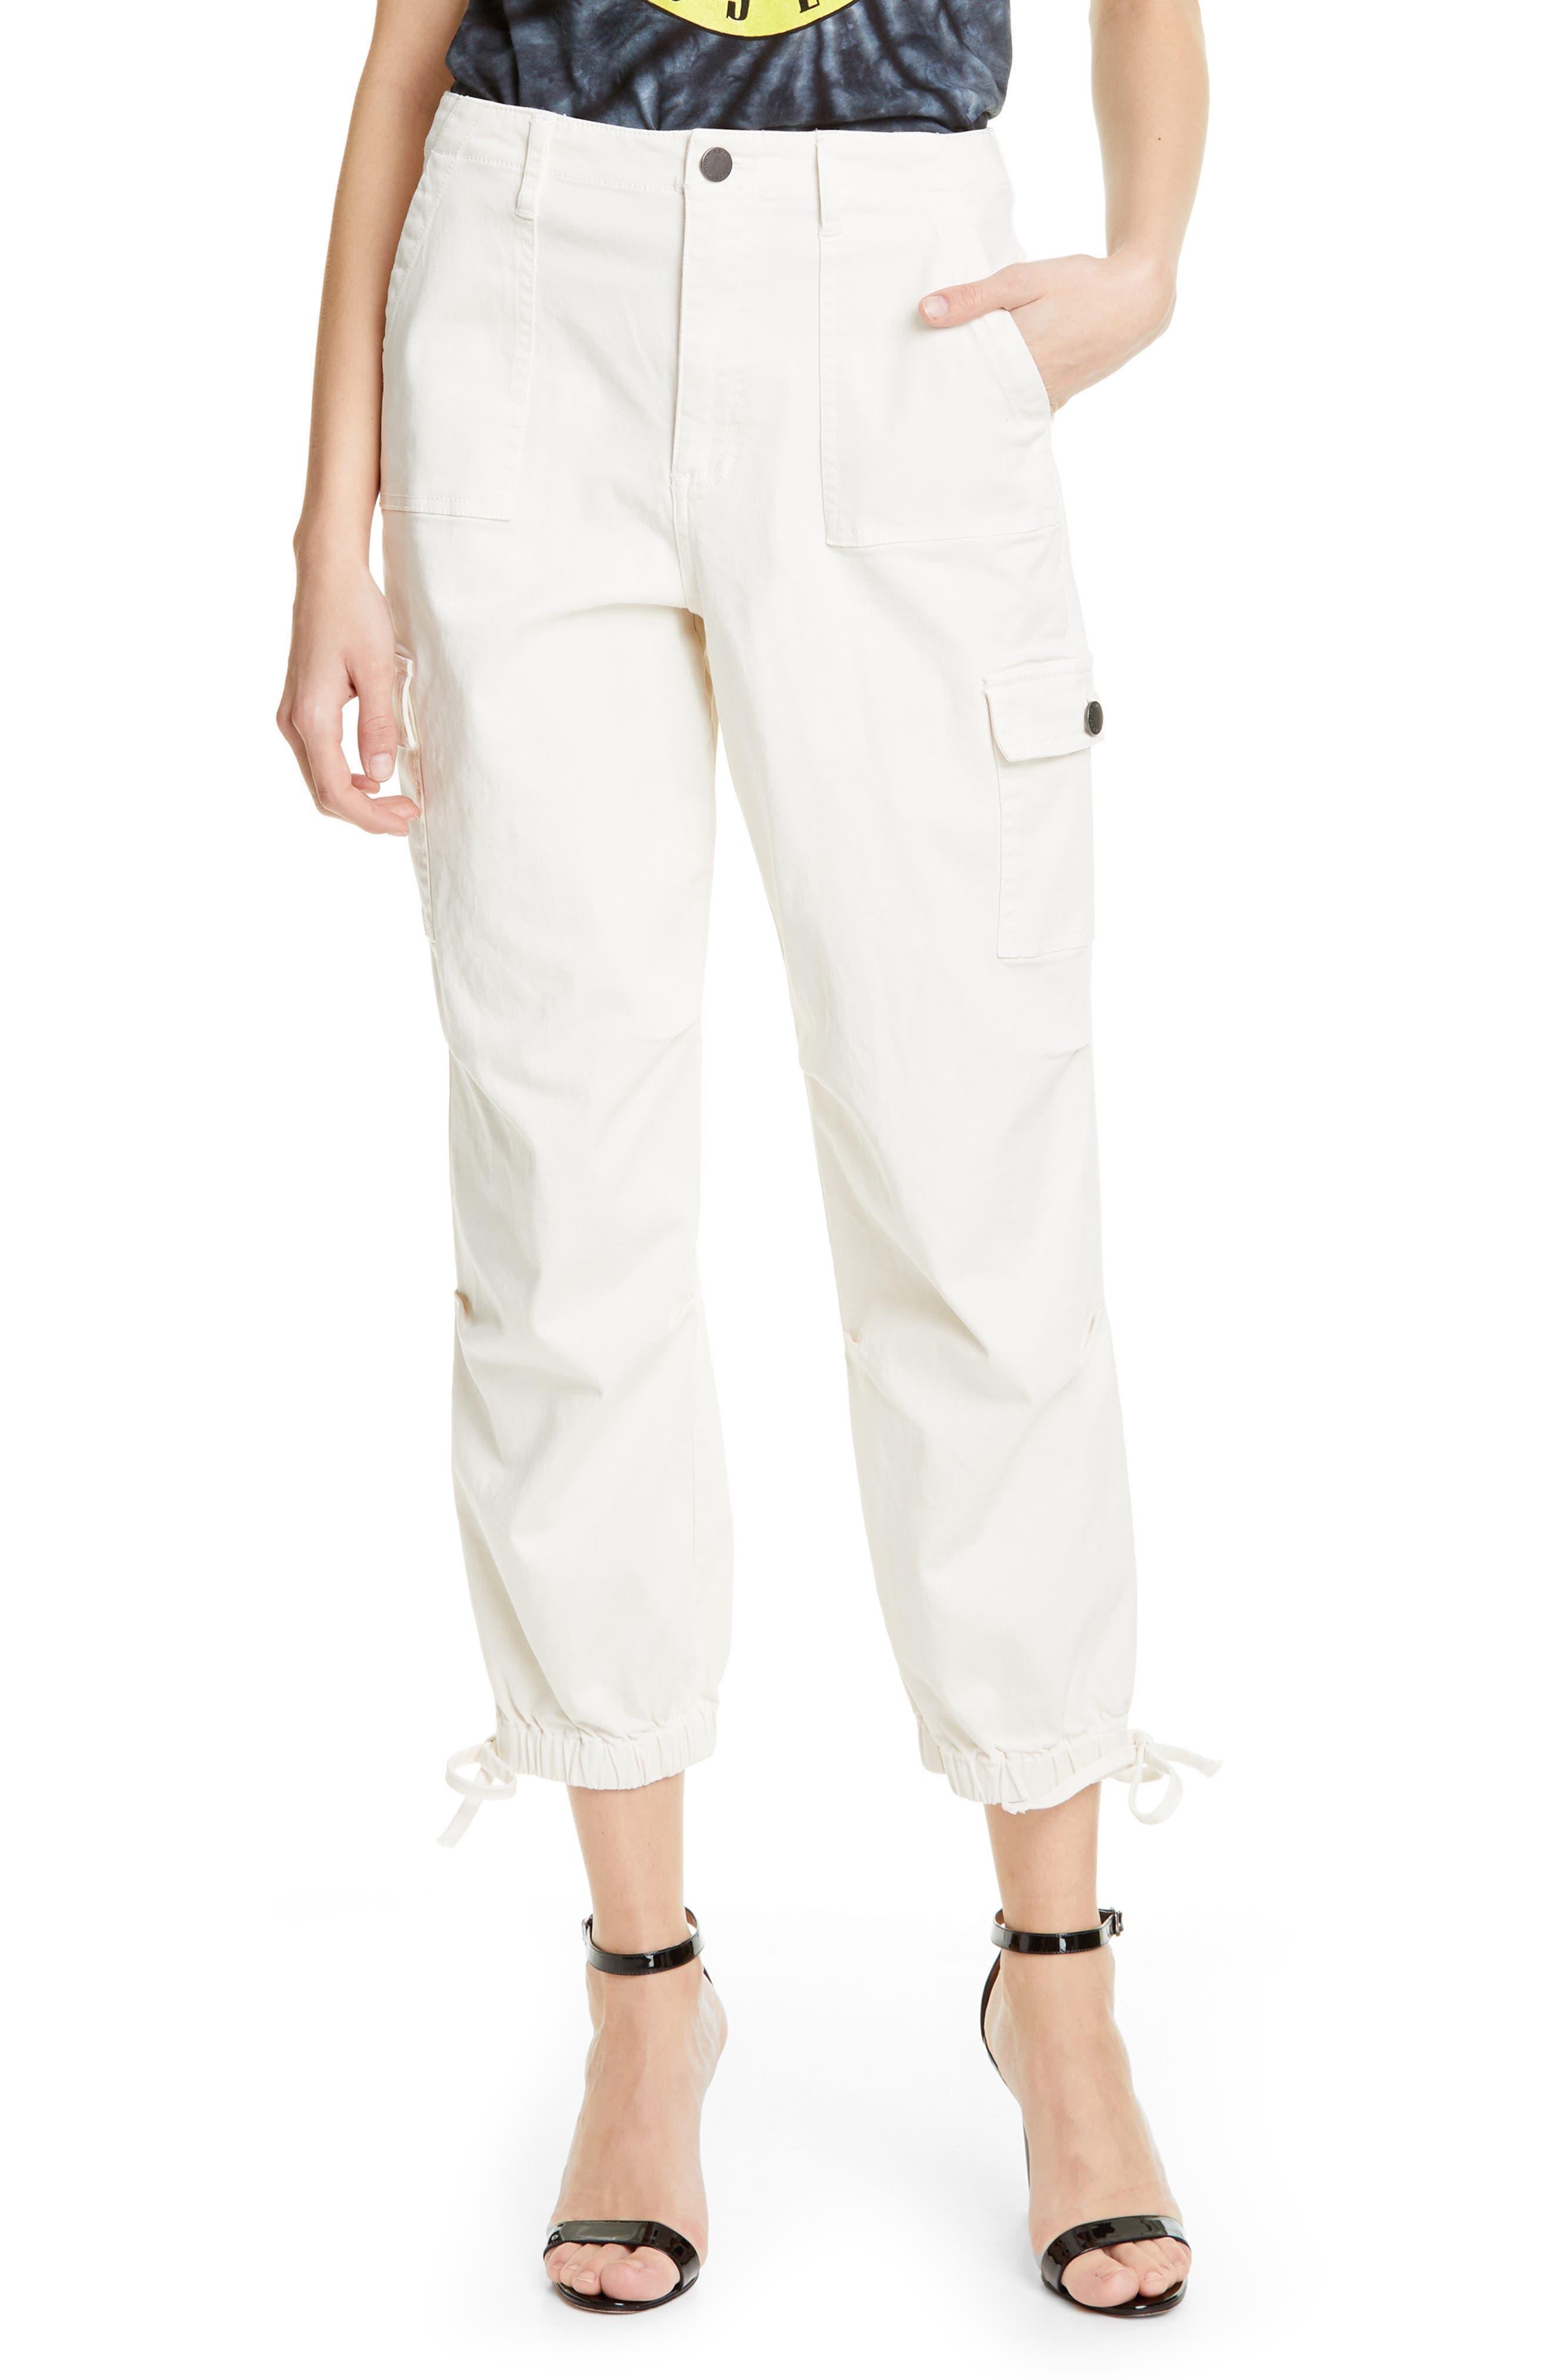 Alice + Olivia Jeans Crop Cargo Pants, White